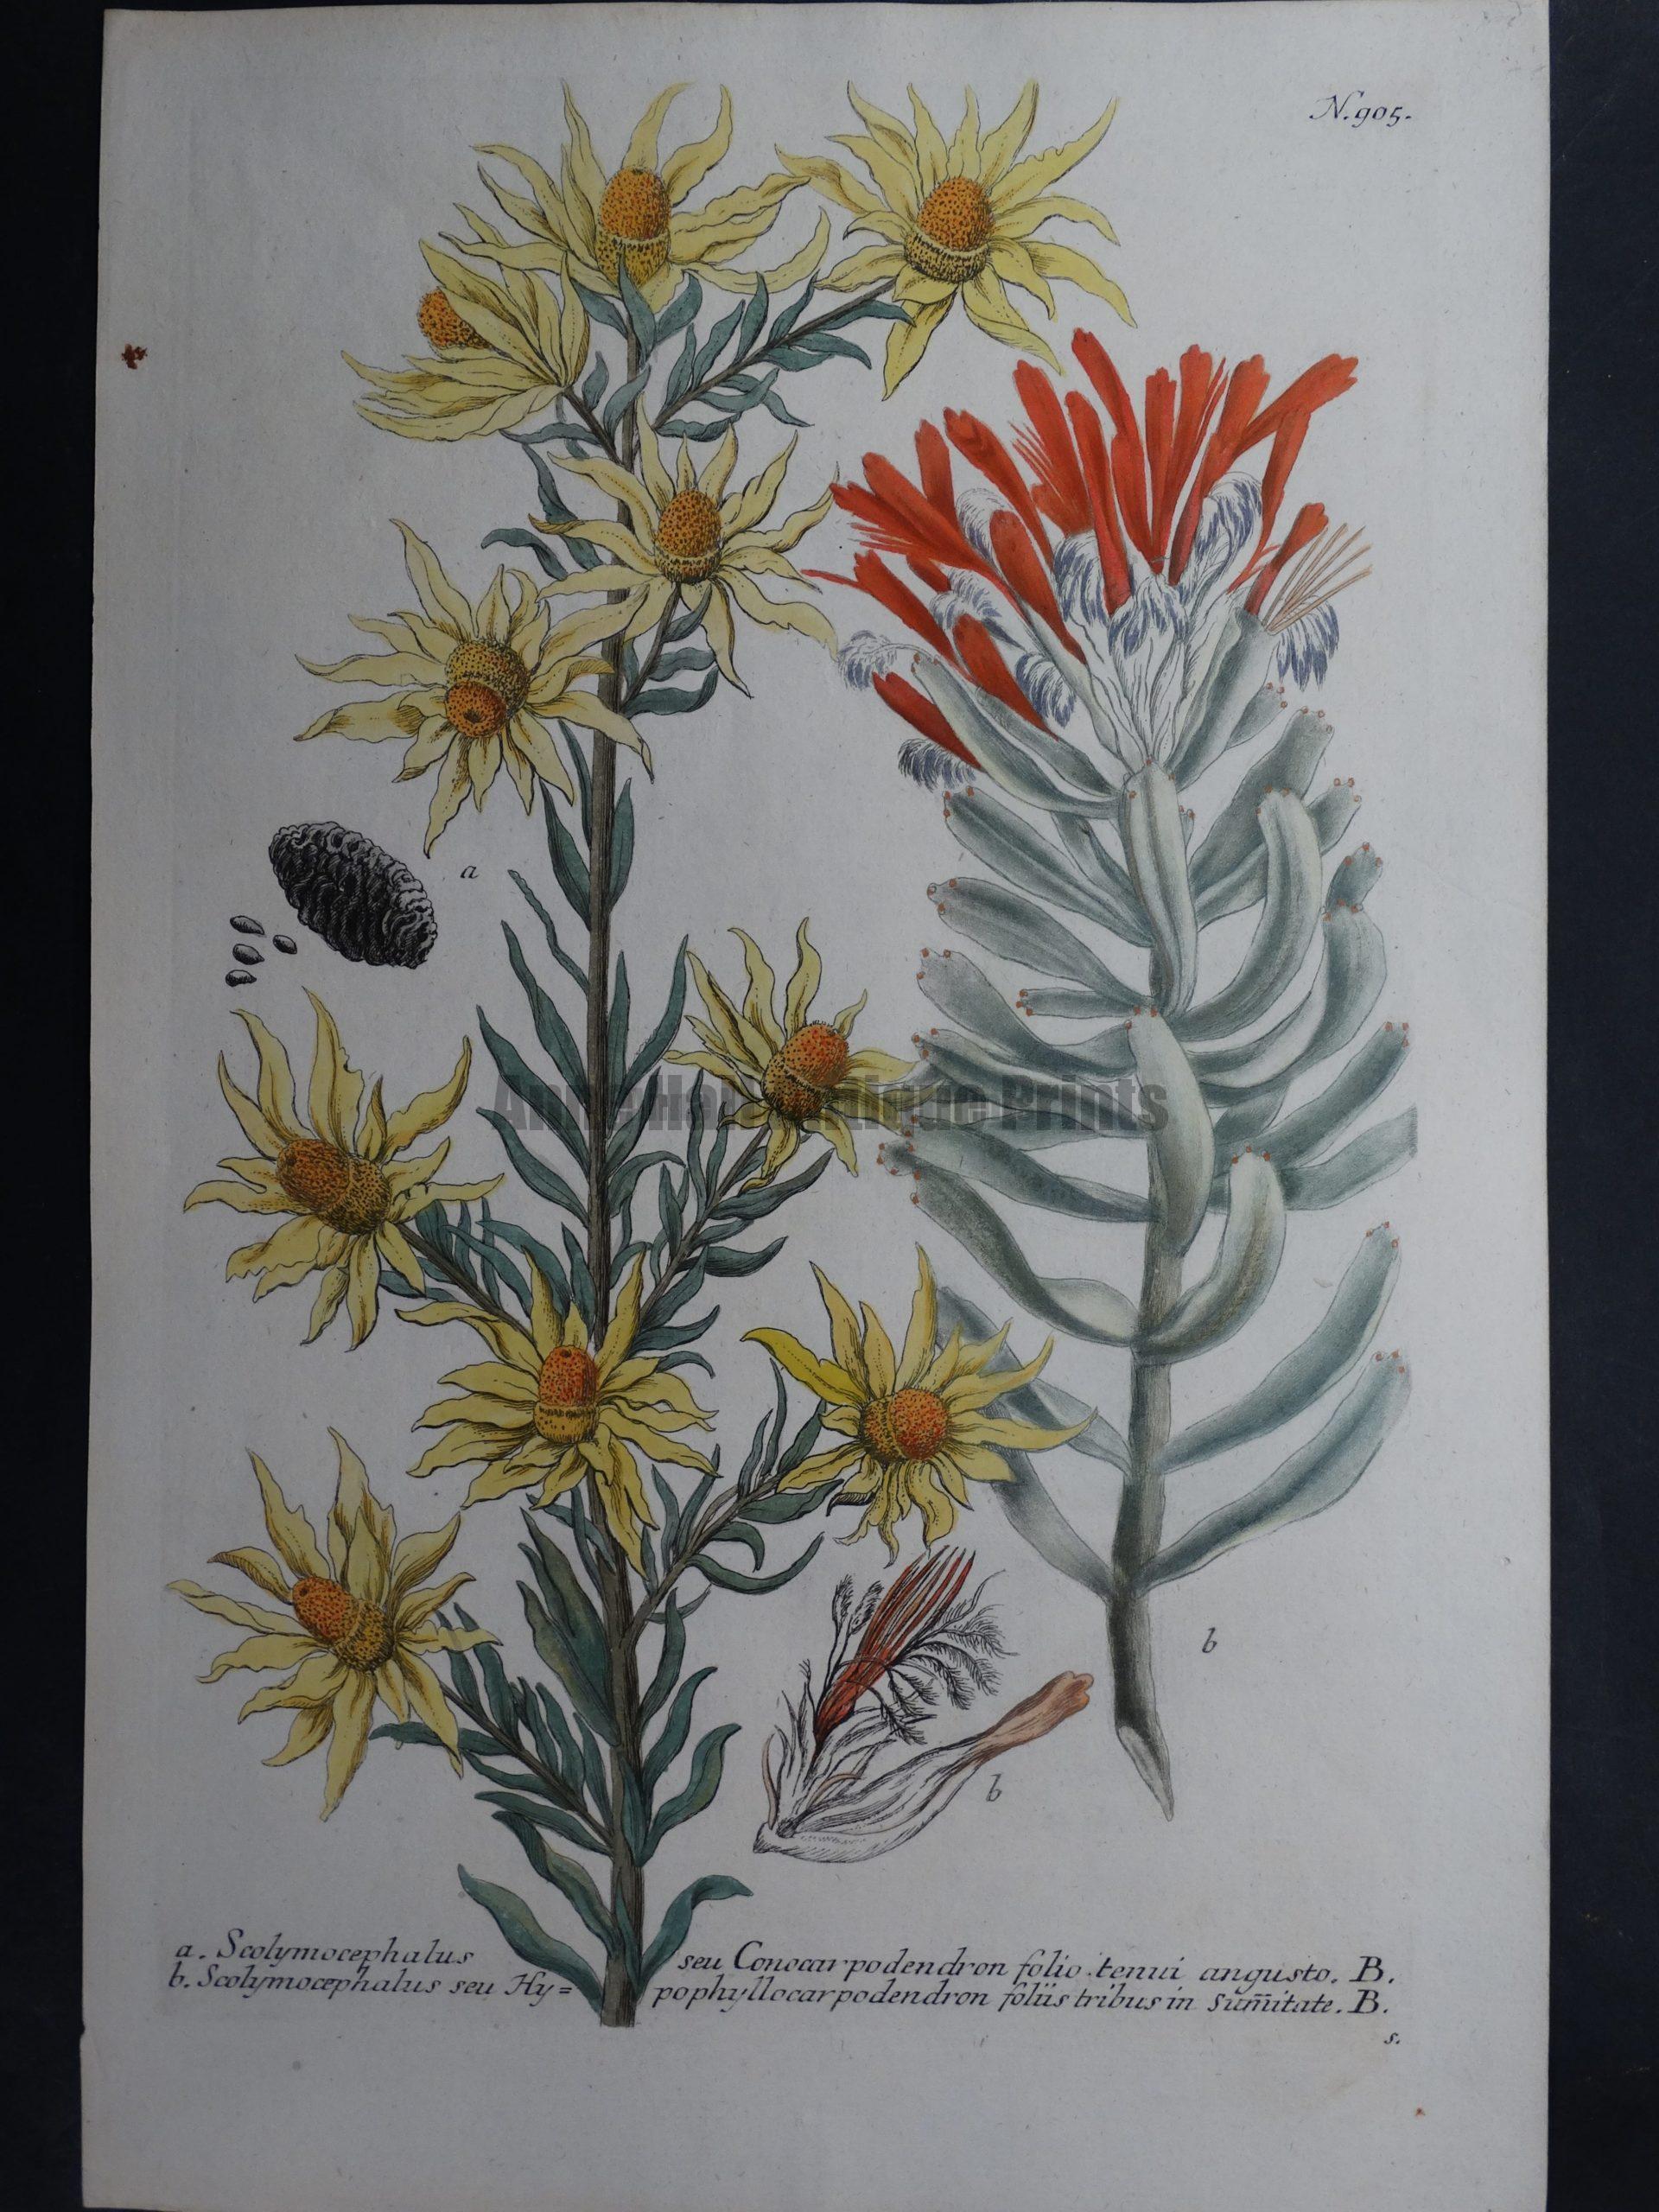 Weinmann Scolymocephalus 905 Johann Wilhelm Weinmann Phytanthoza iconographia. 1737-1745.  9.5x15.25 in.